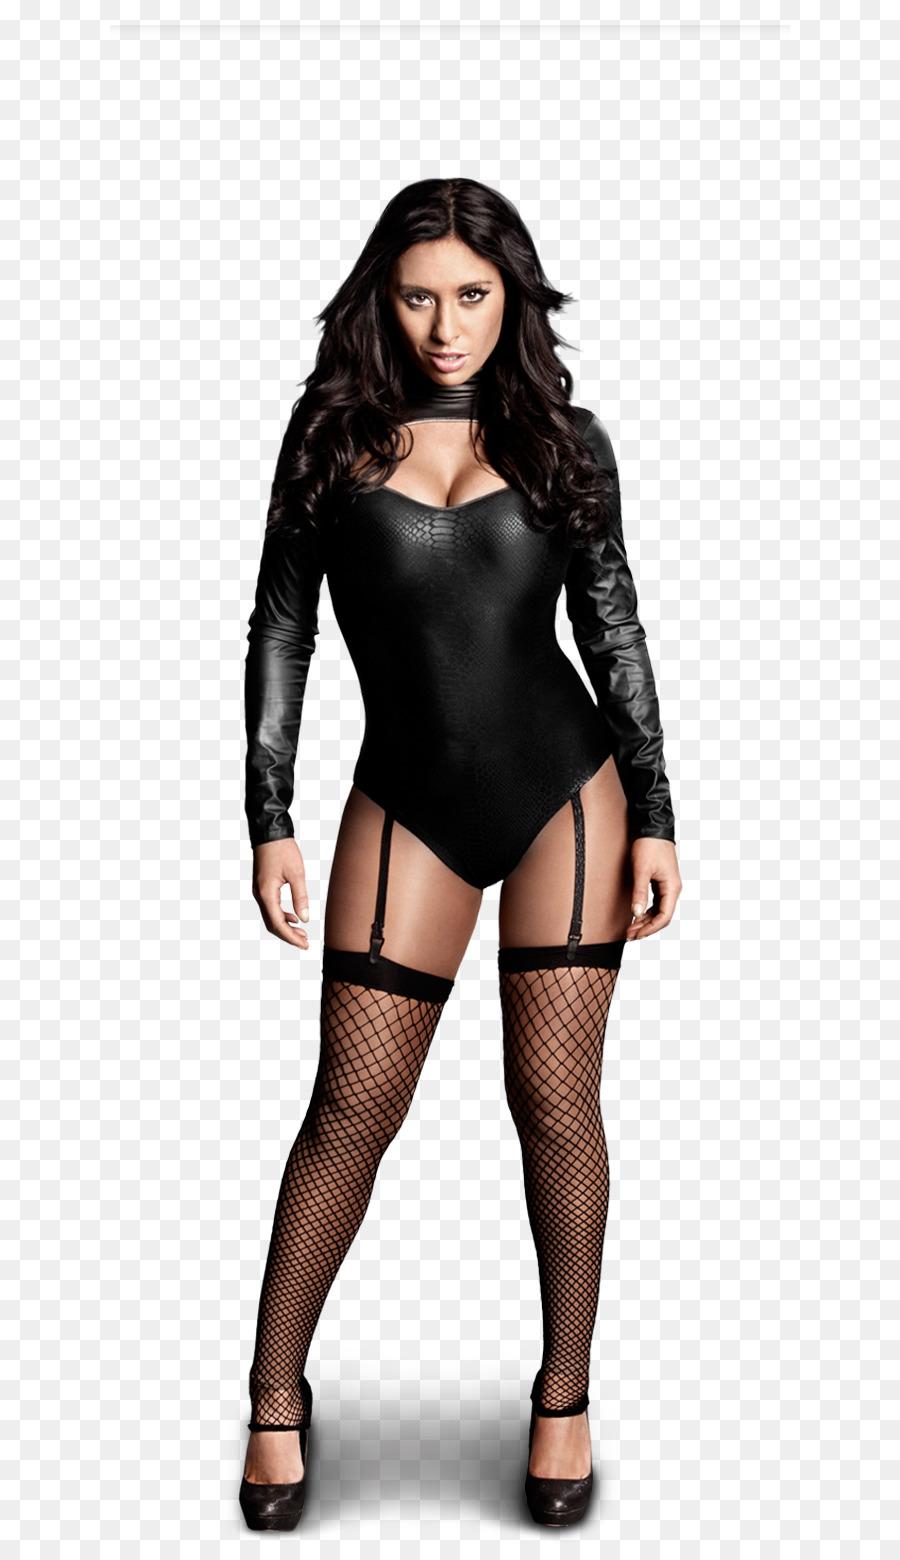 Catrina (wrestler) nudes (26 foto and video), Topless, Is a cute, Boobs, in bikini 2006